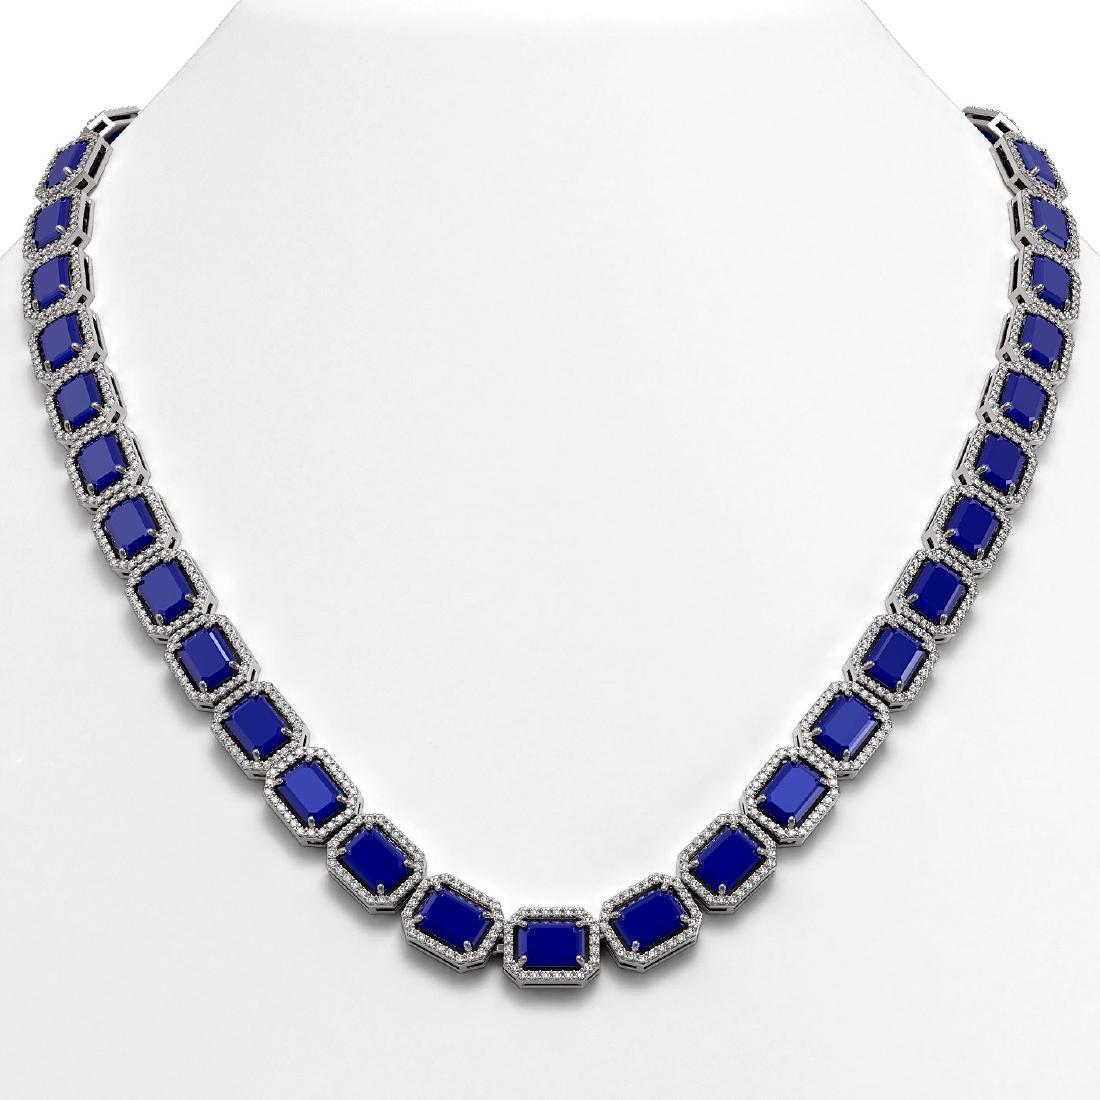 58.59 CTW Sapphire & Diamond Halo Necklace 10K White